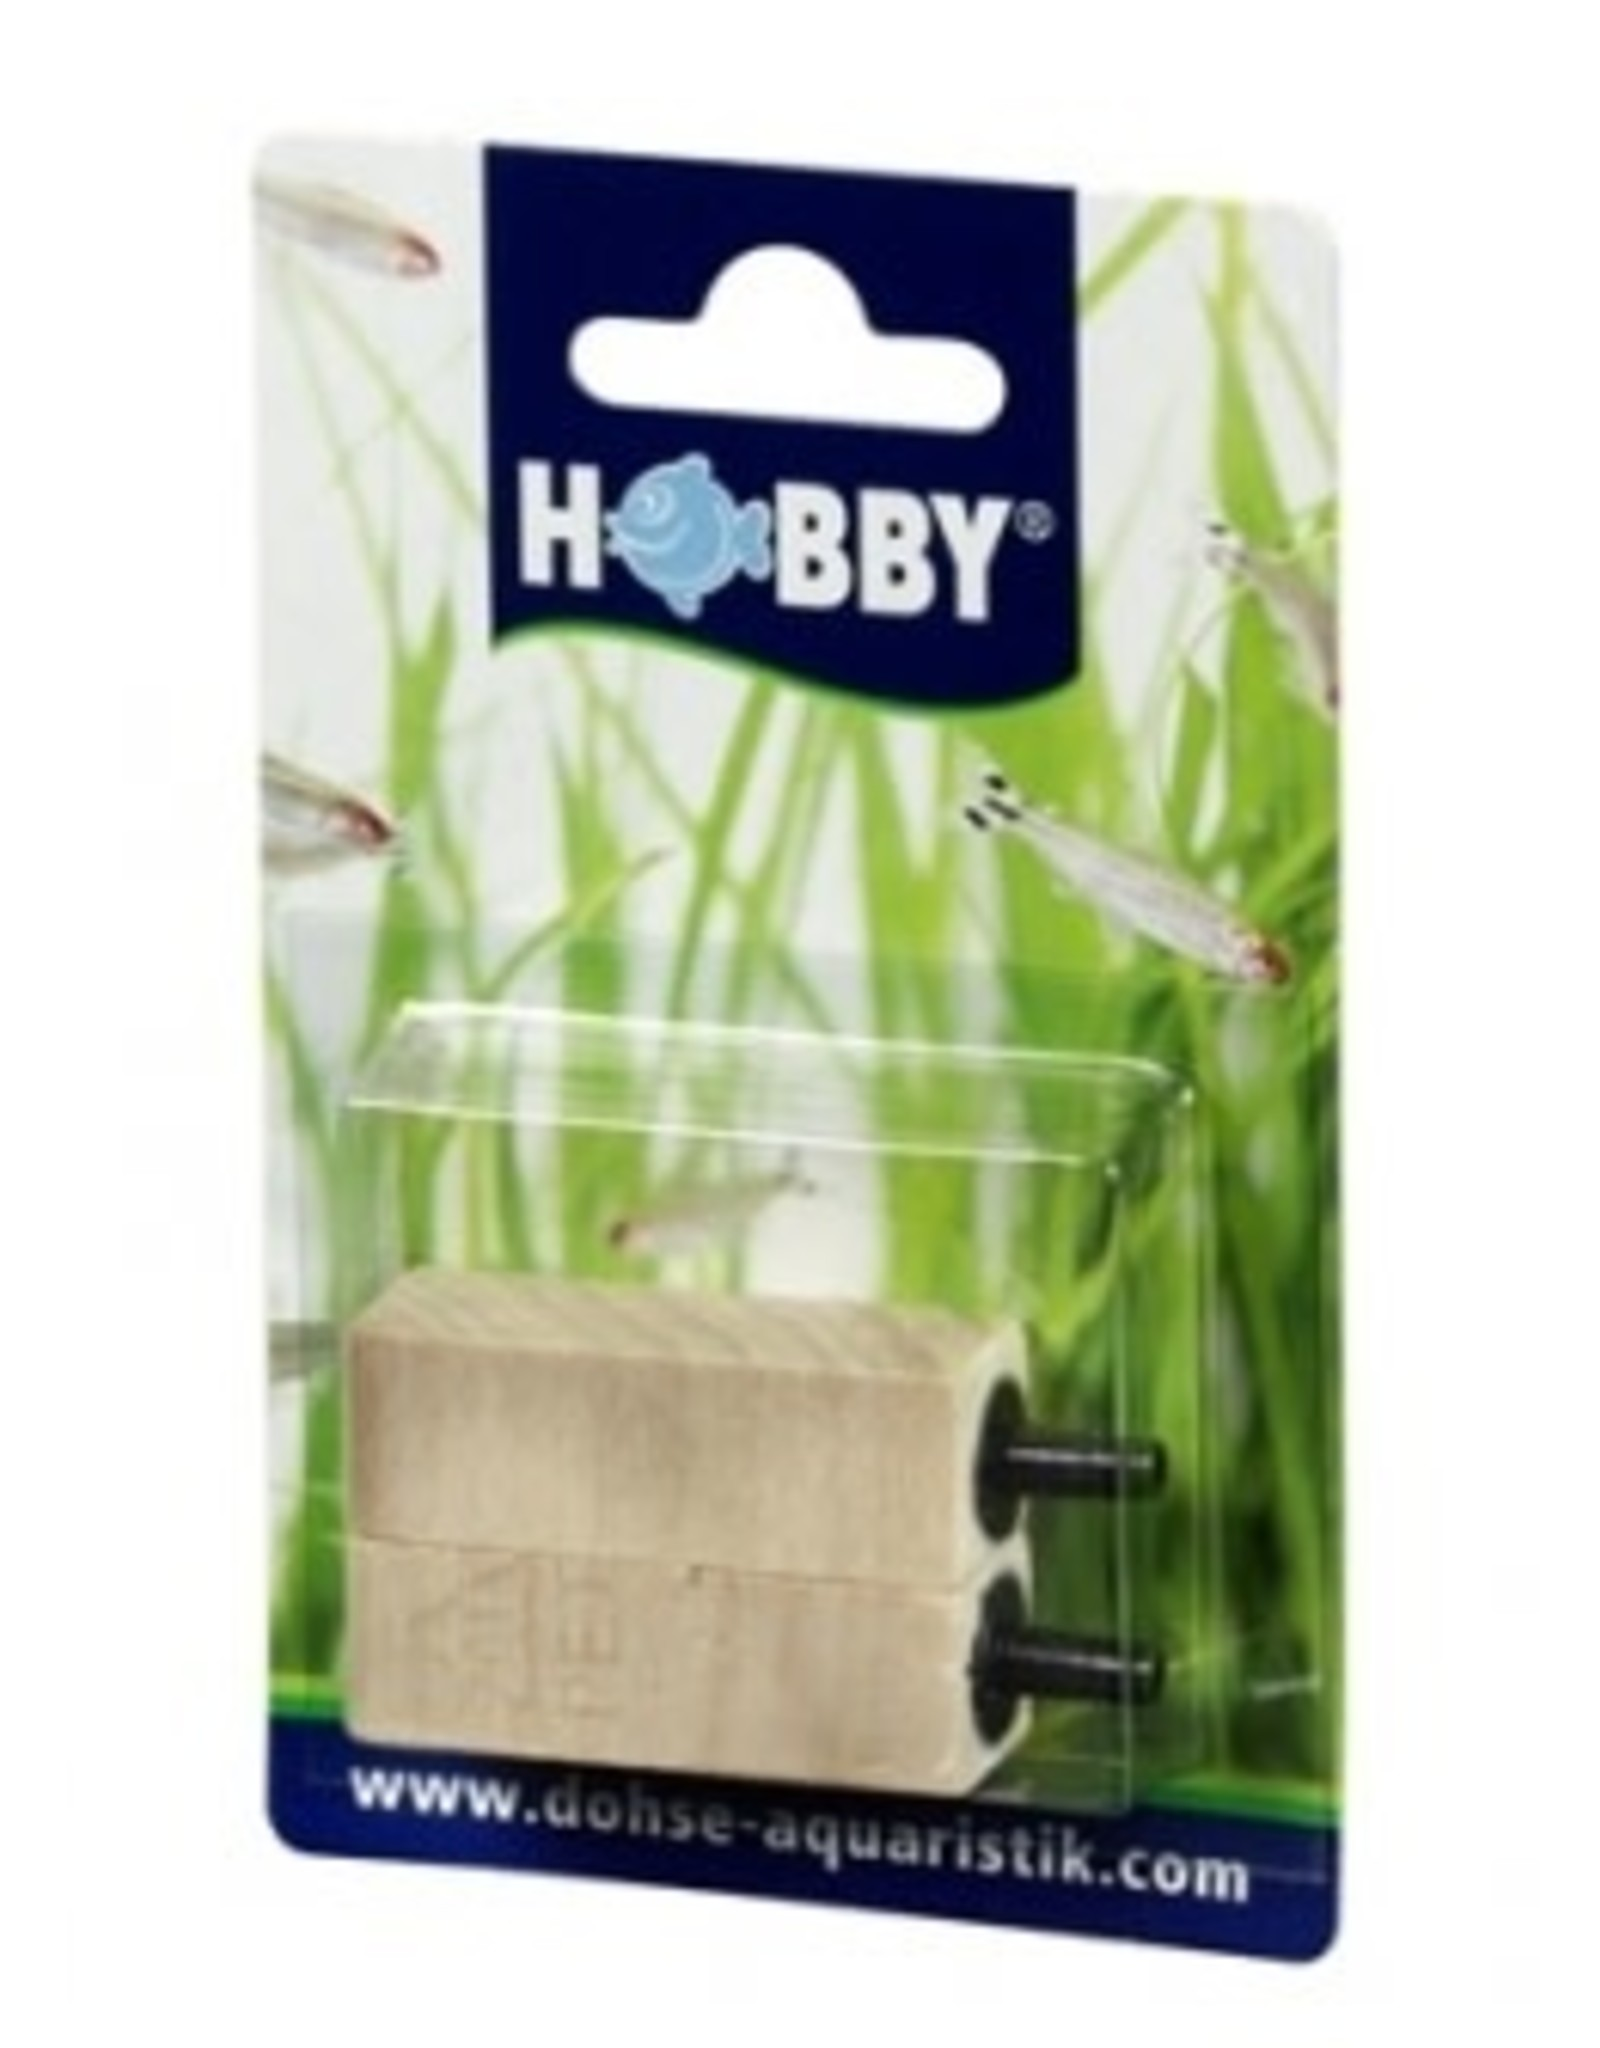 Hobby Diffuseur BOIS (2pc) 75x15x15mm